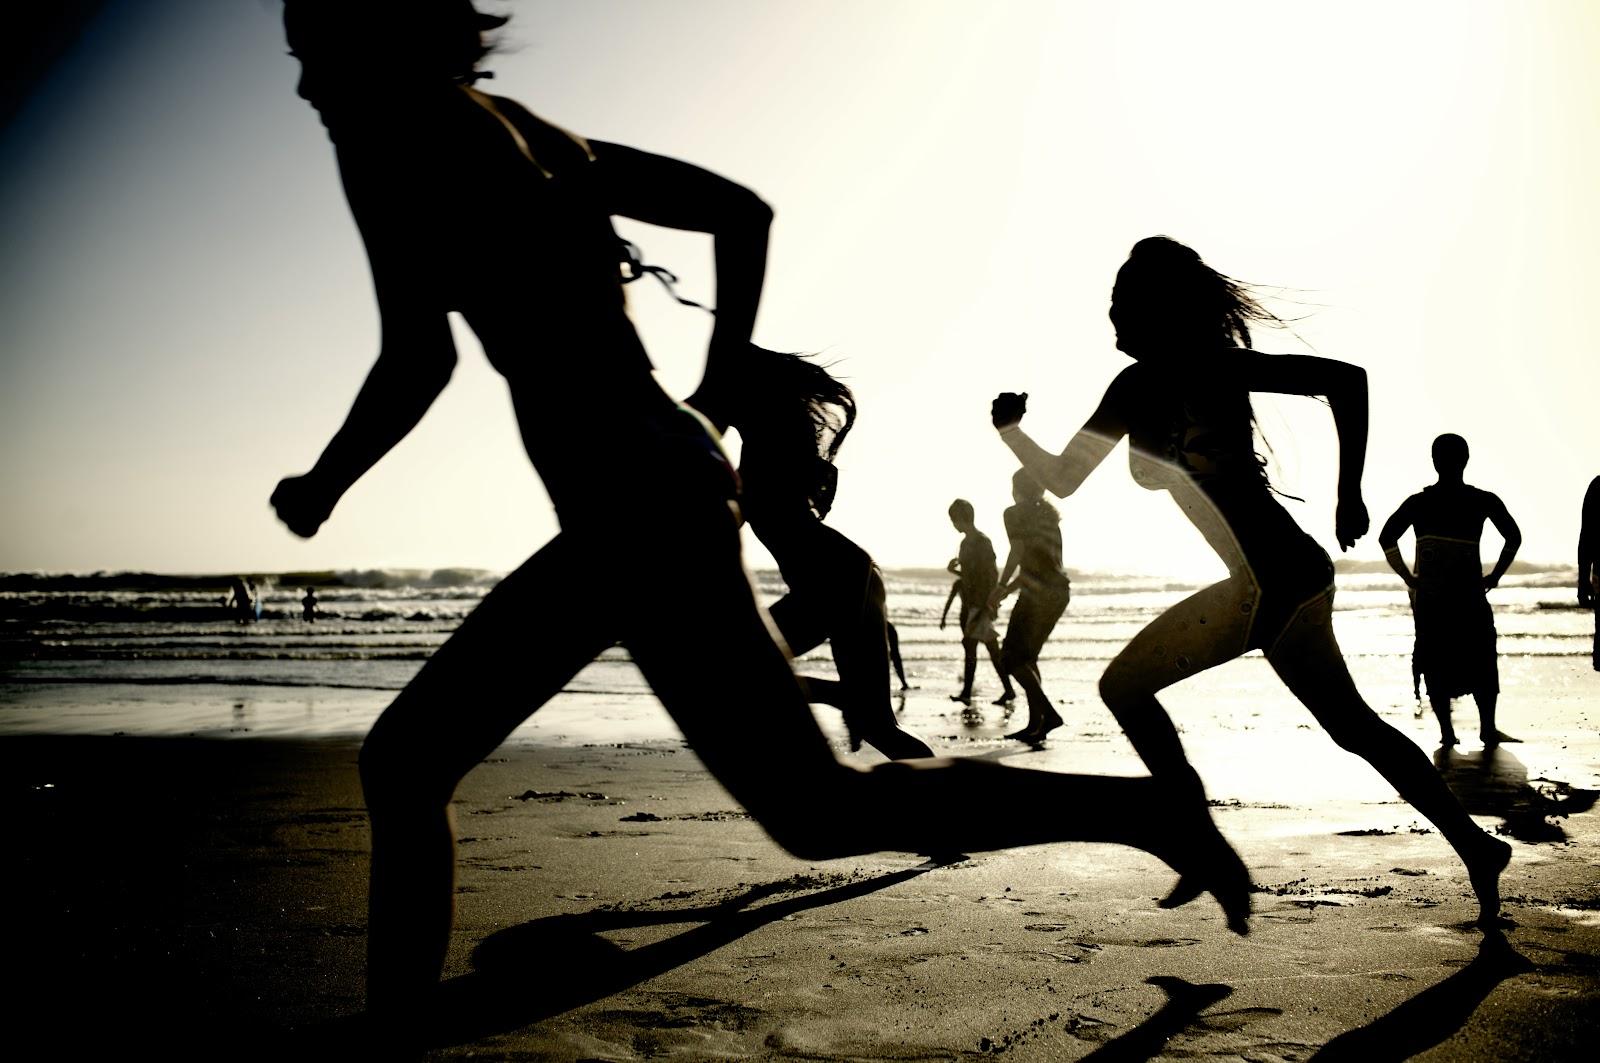 Girls_running_on_the_beach_(62902).jpg